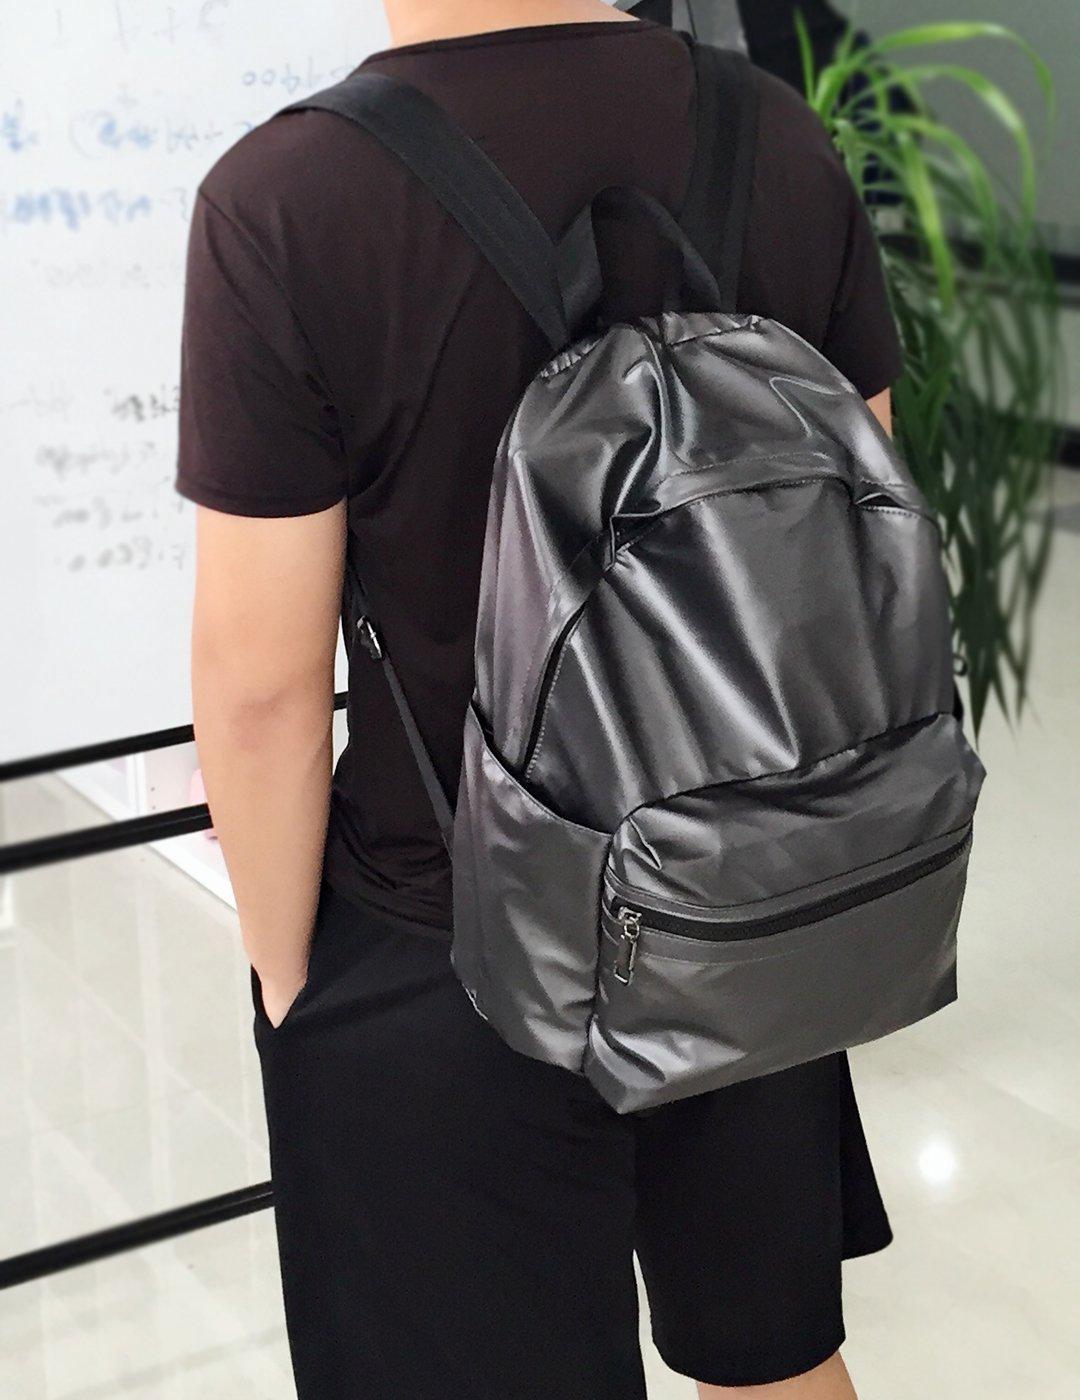 ZORFIN Fashion Nylon Backpack for Women&Men Rucksack Purse School Bags for Girls Waterproof Book Bag by ZORFIN (Image #6)